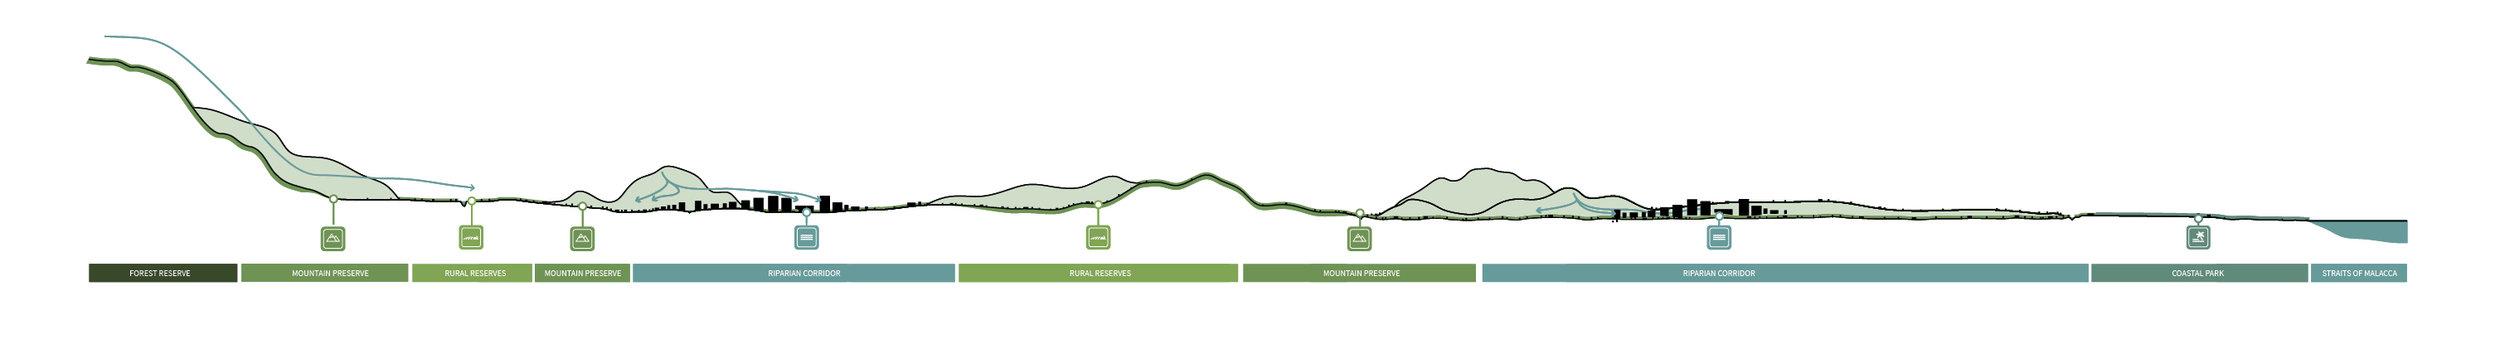 Malaysia-Vision-Valley_Regional-Landscape-Typologies-Section_Klopfer-Martin.jpg